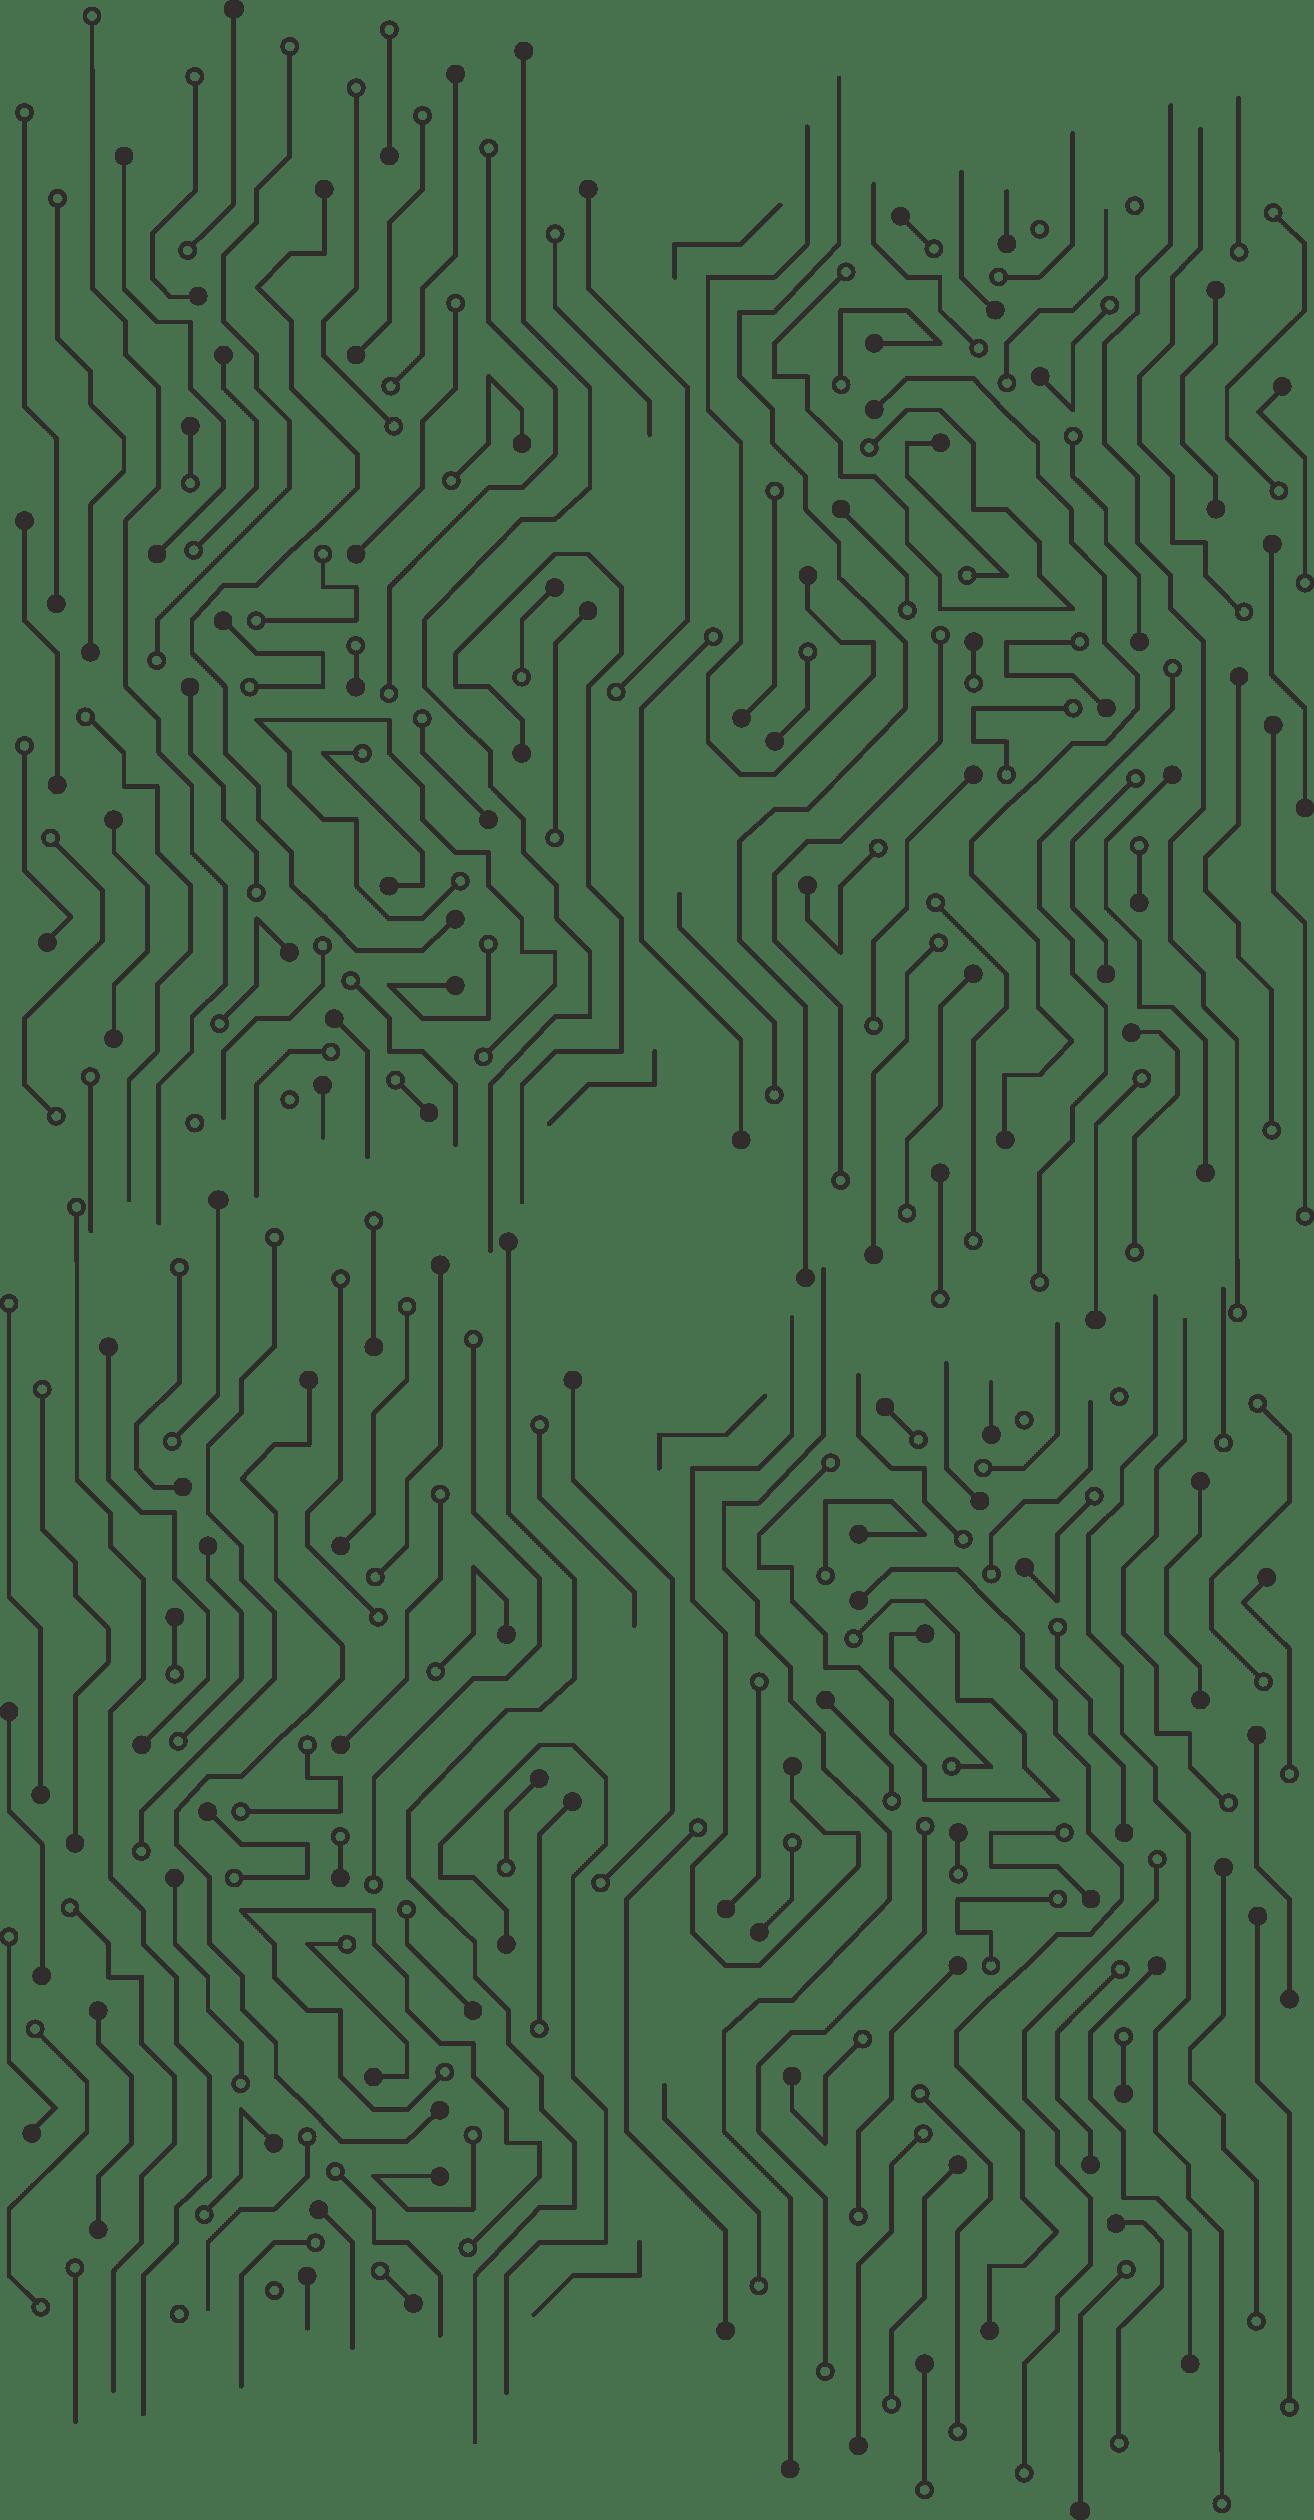 light grey circuit board pattern